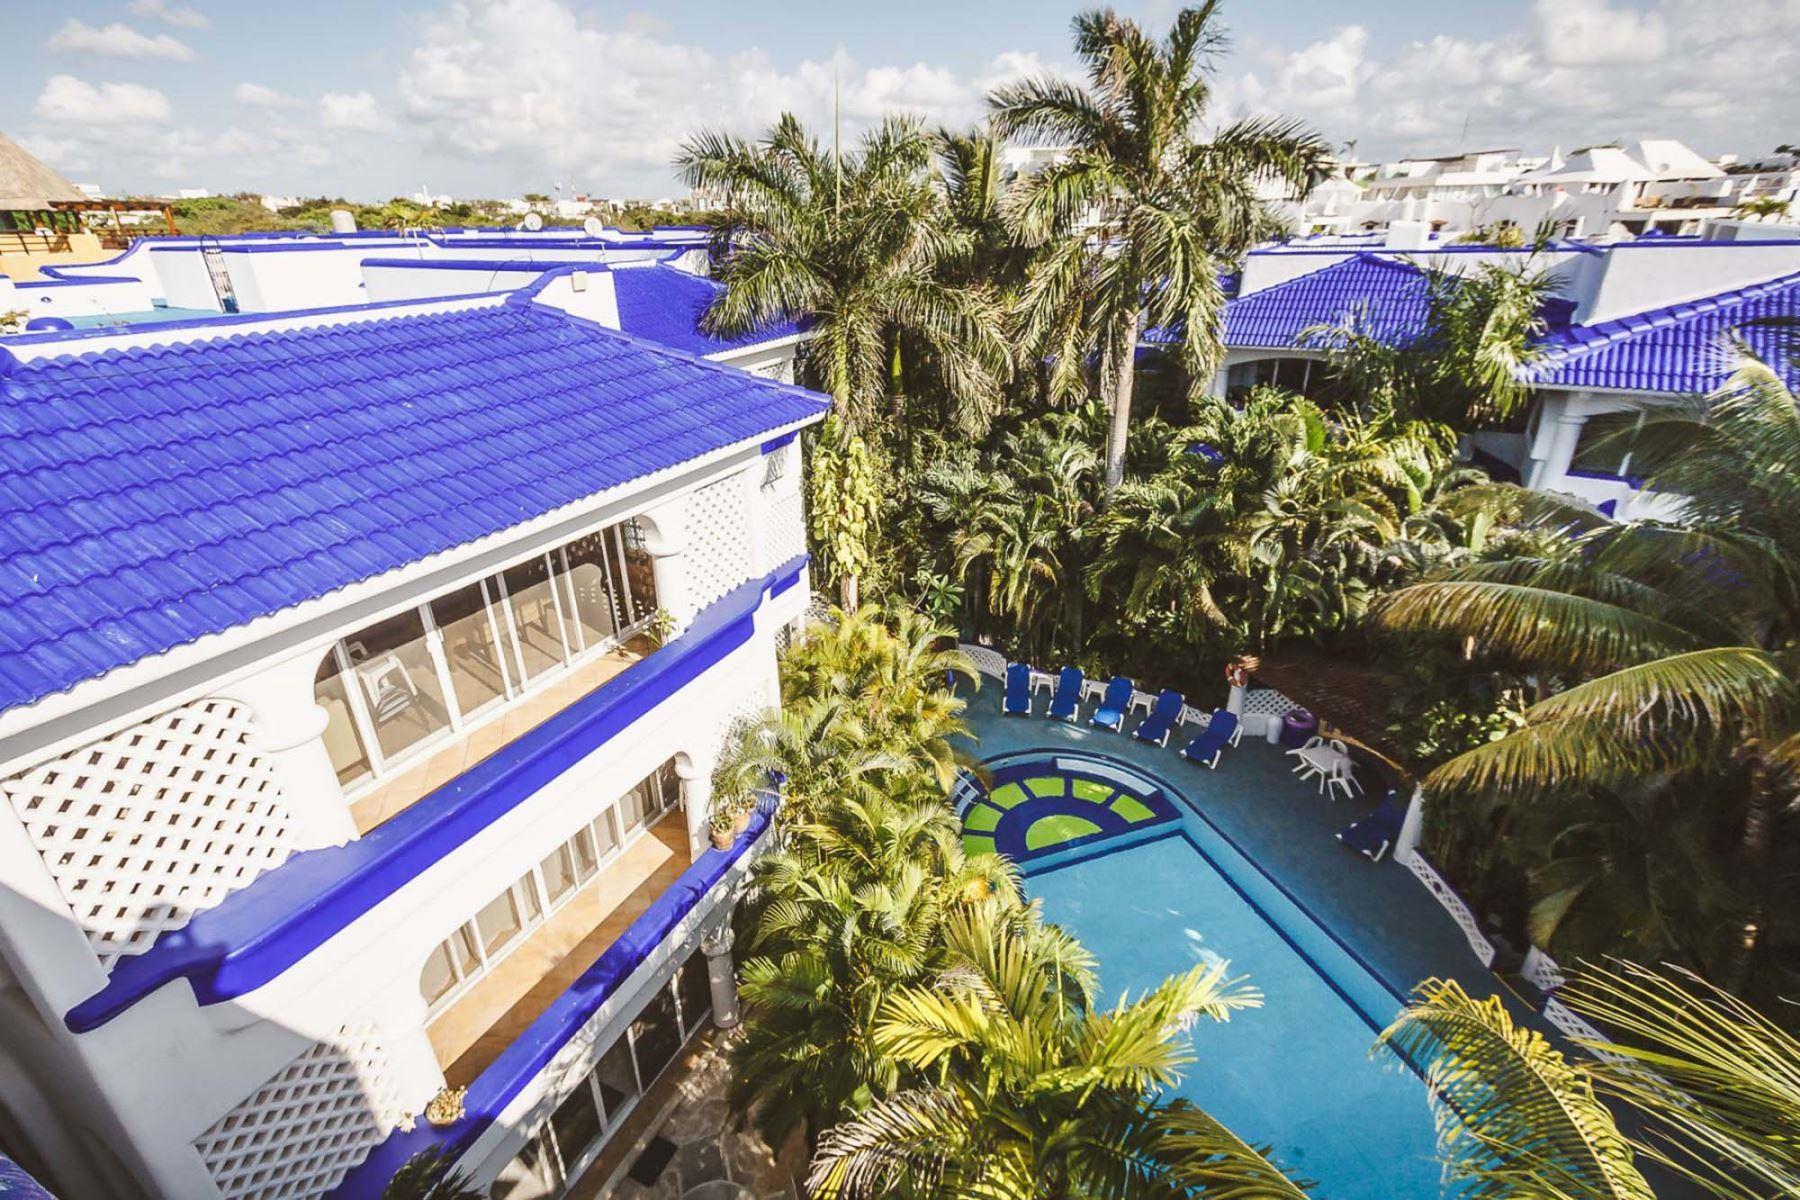 Natz Ti Ha Common Area Pool with Lounge Chairs